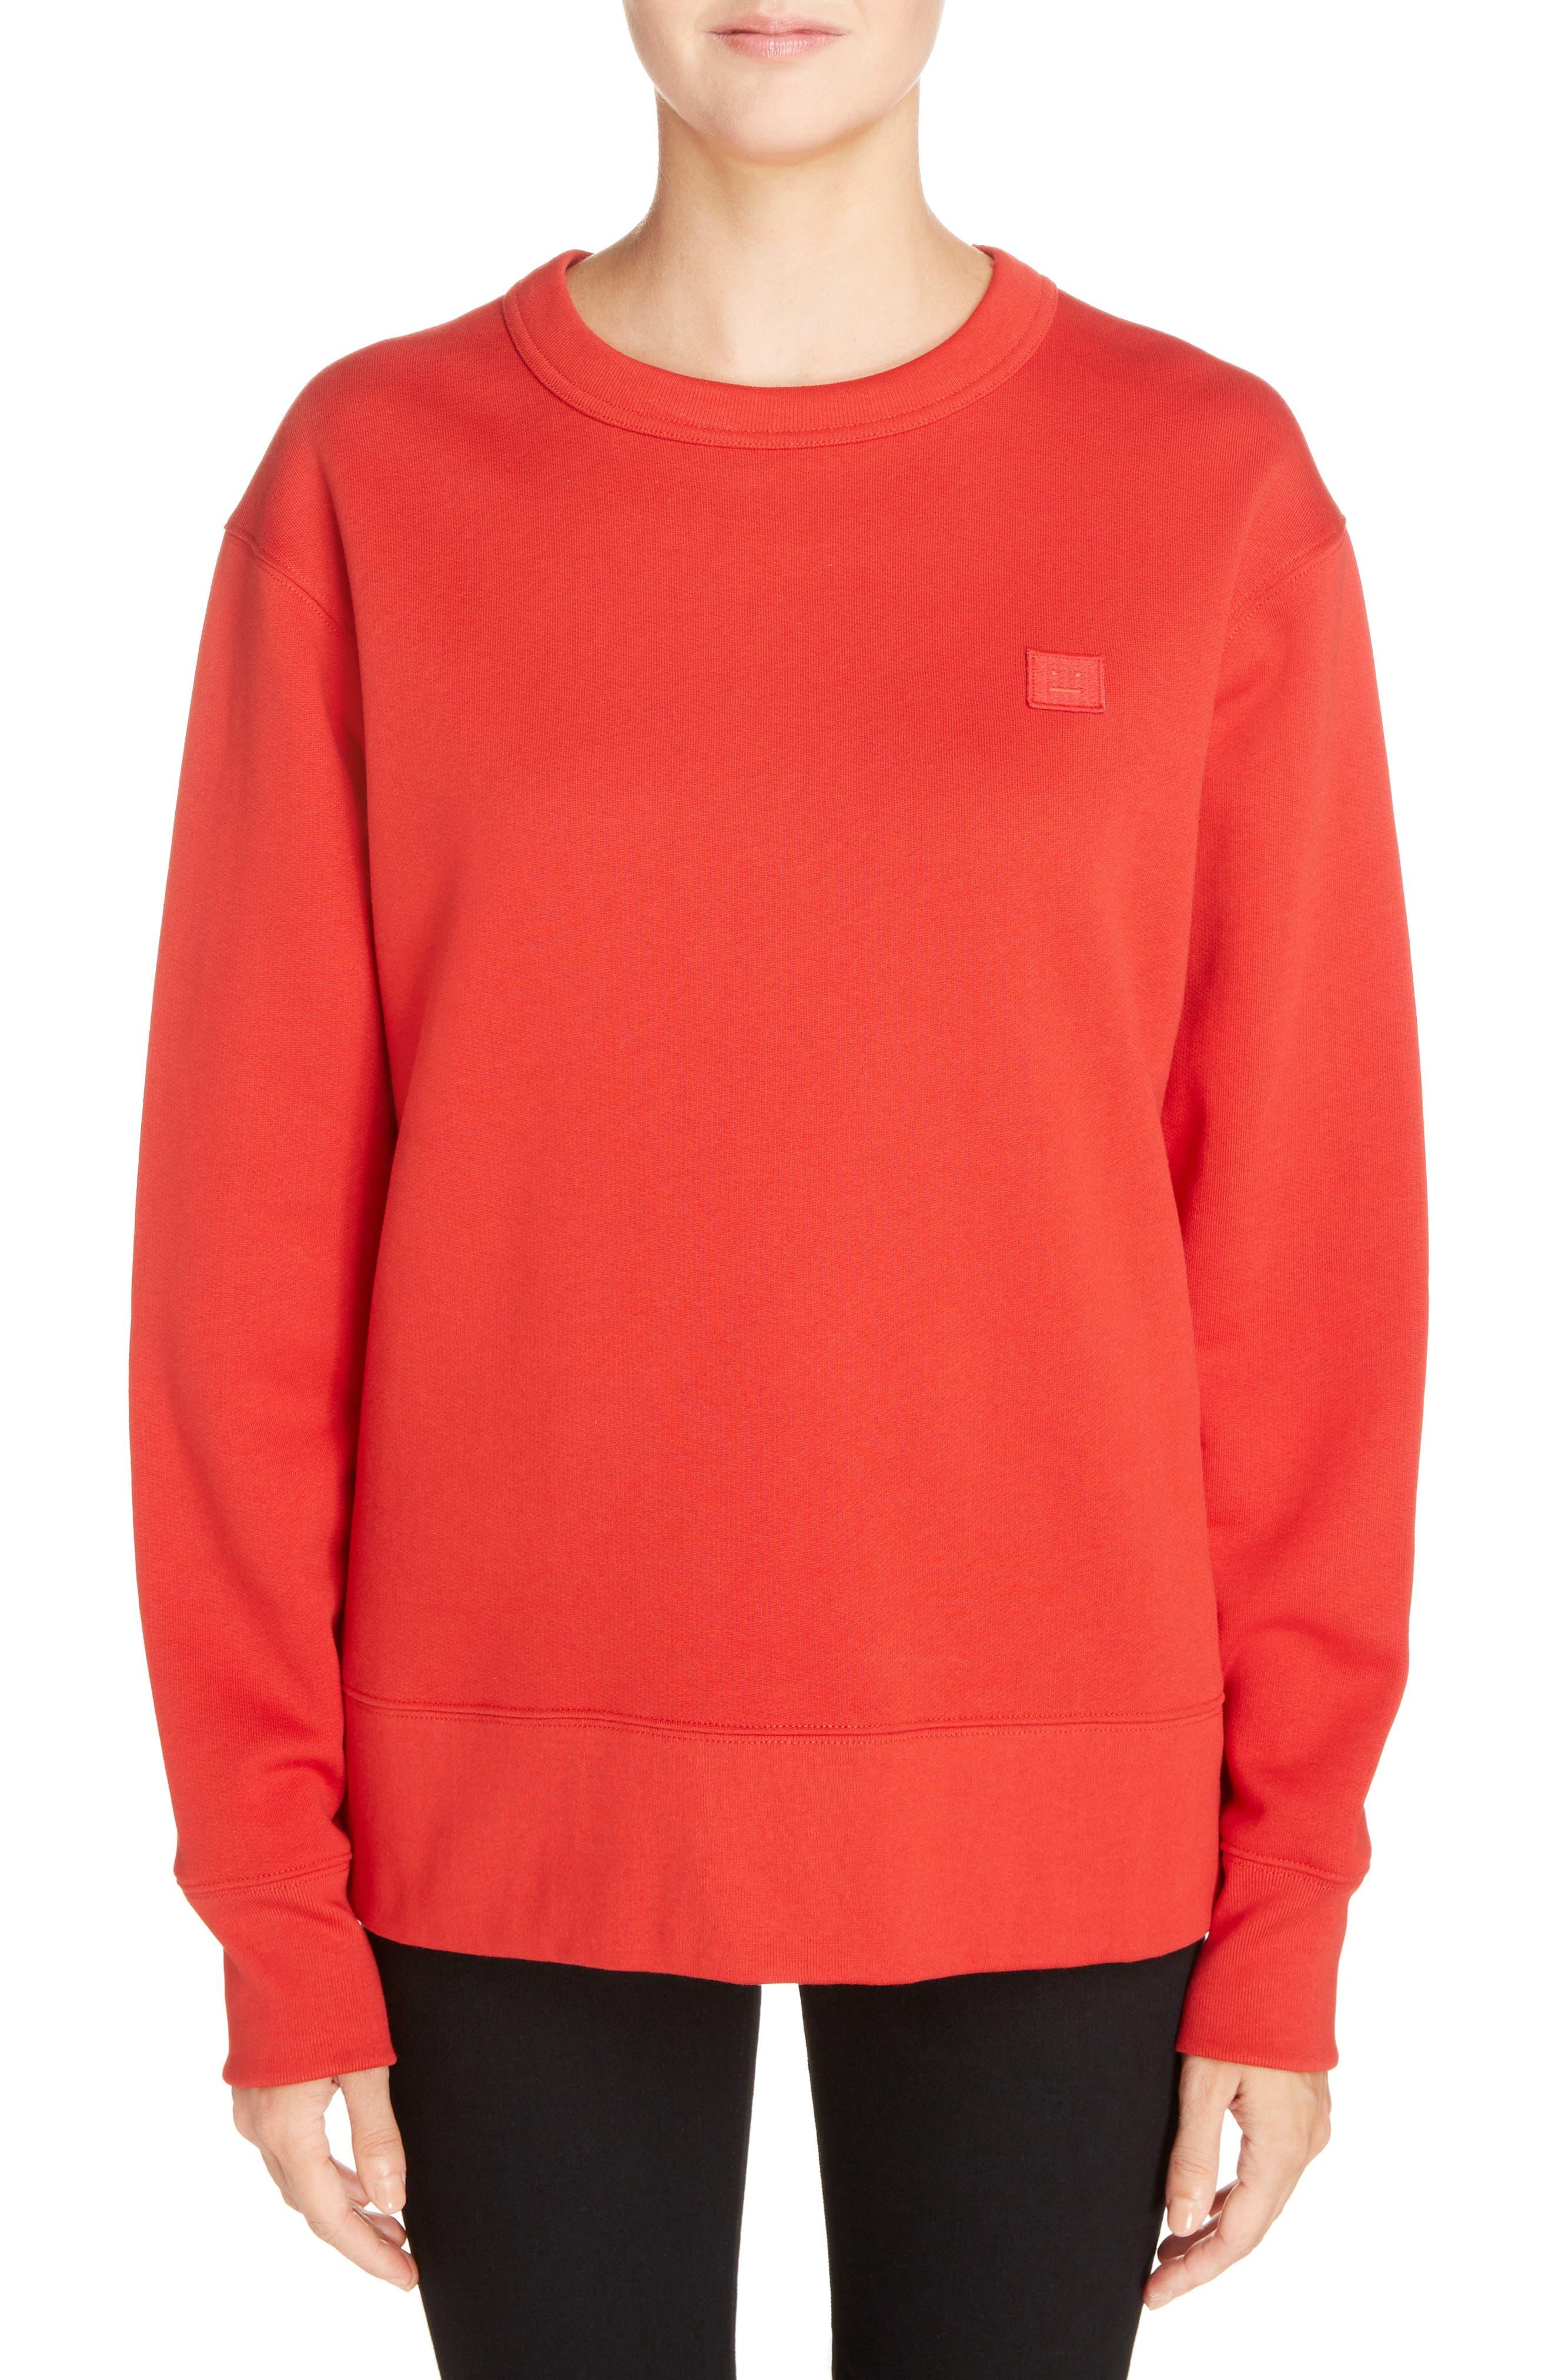 Alternate Image 1 Selected - ACNE Studios Fairview Crewneck Sweatshirt